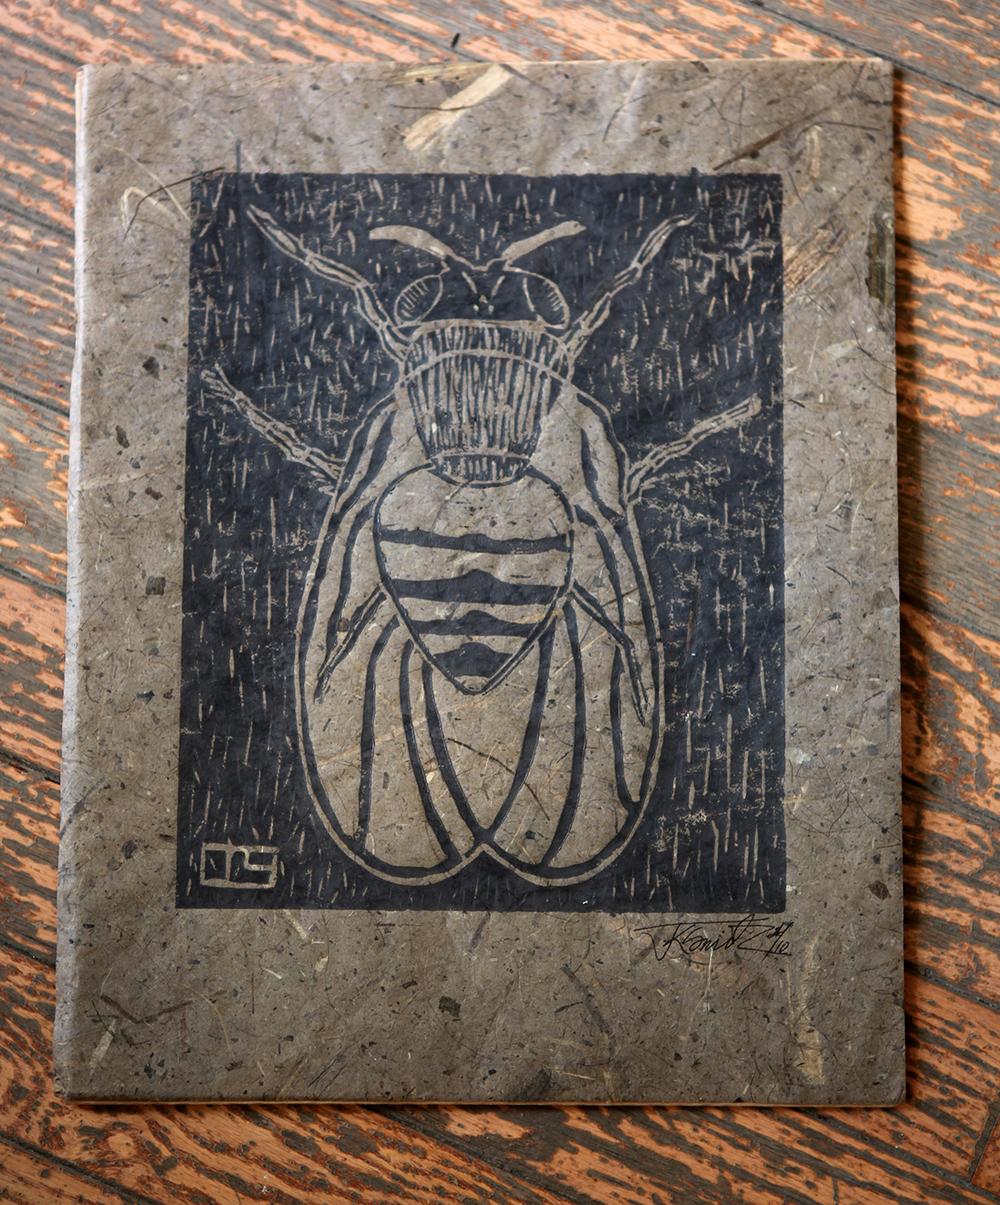 'Fly' Linocut print on banana paper, $25